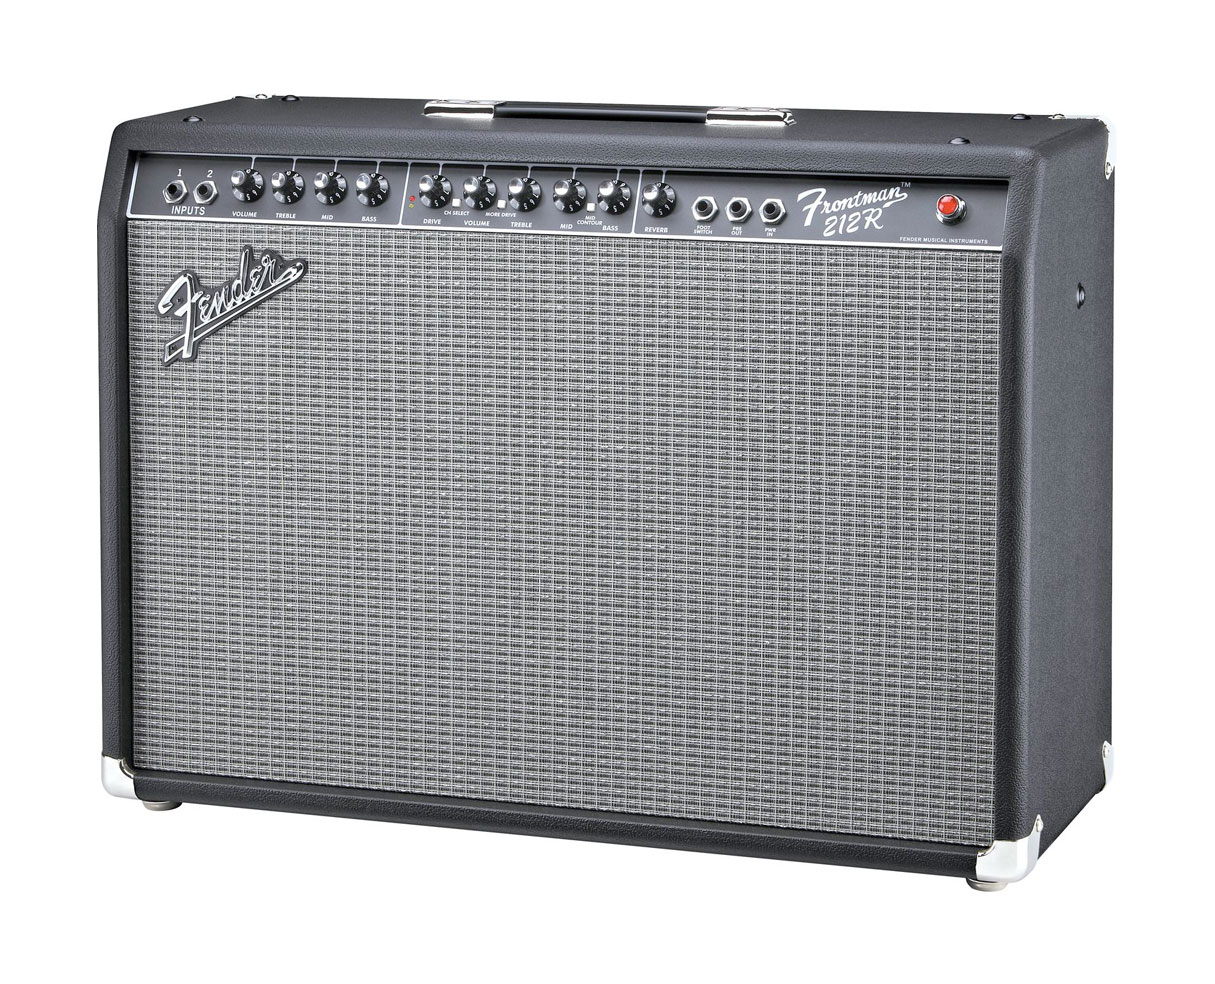 fender frontman 212r 100w 2x12 guitar combo amp black proaudiostar. Black Bedroom Furniture Sets. Home Design Ideas